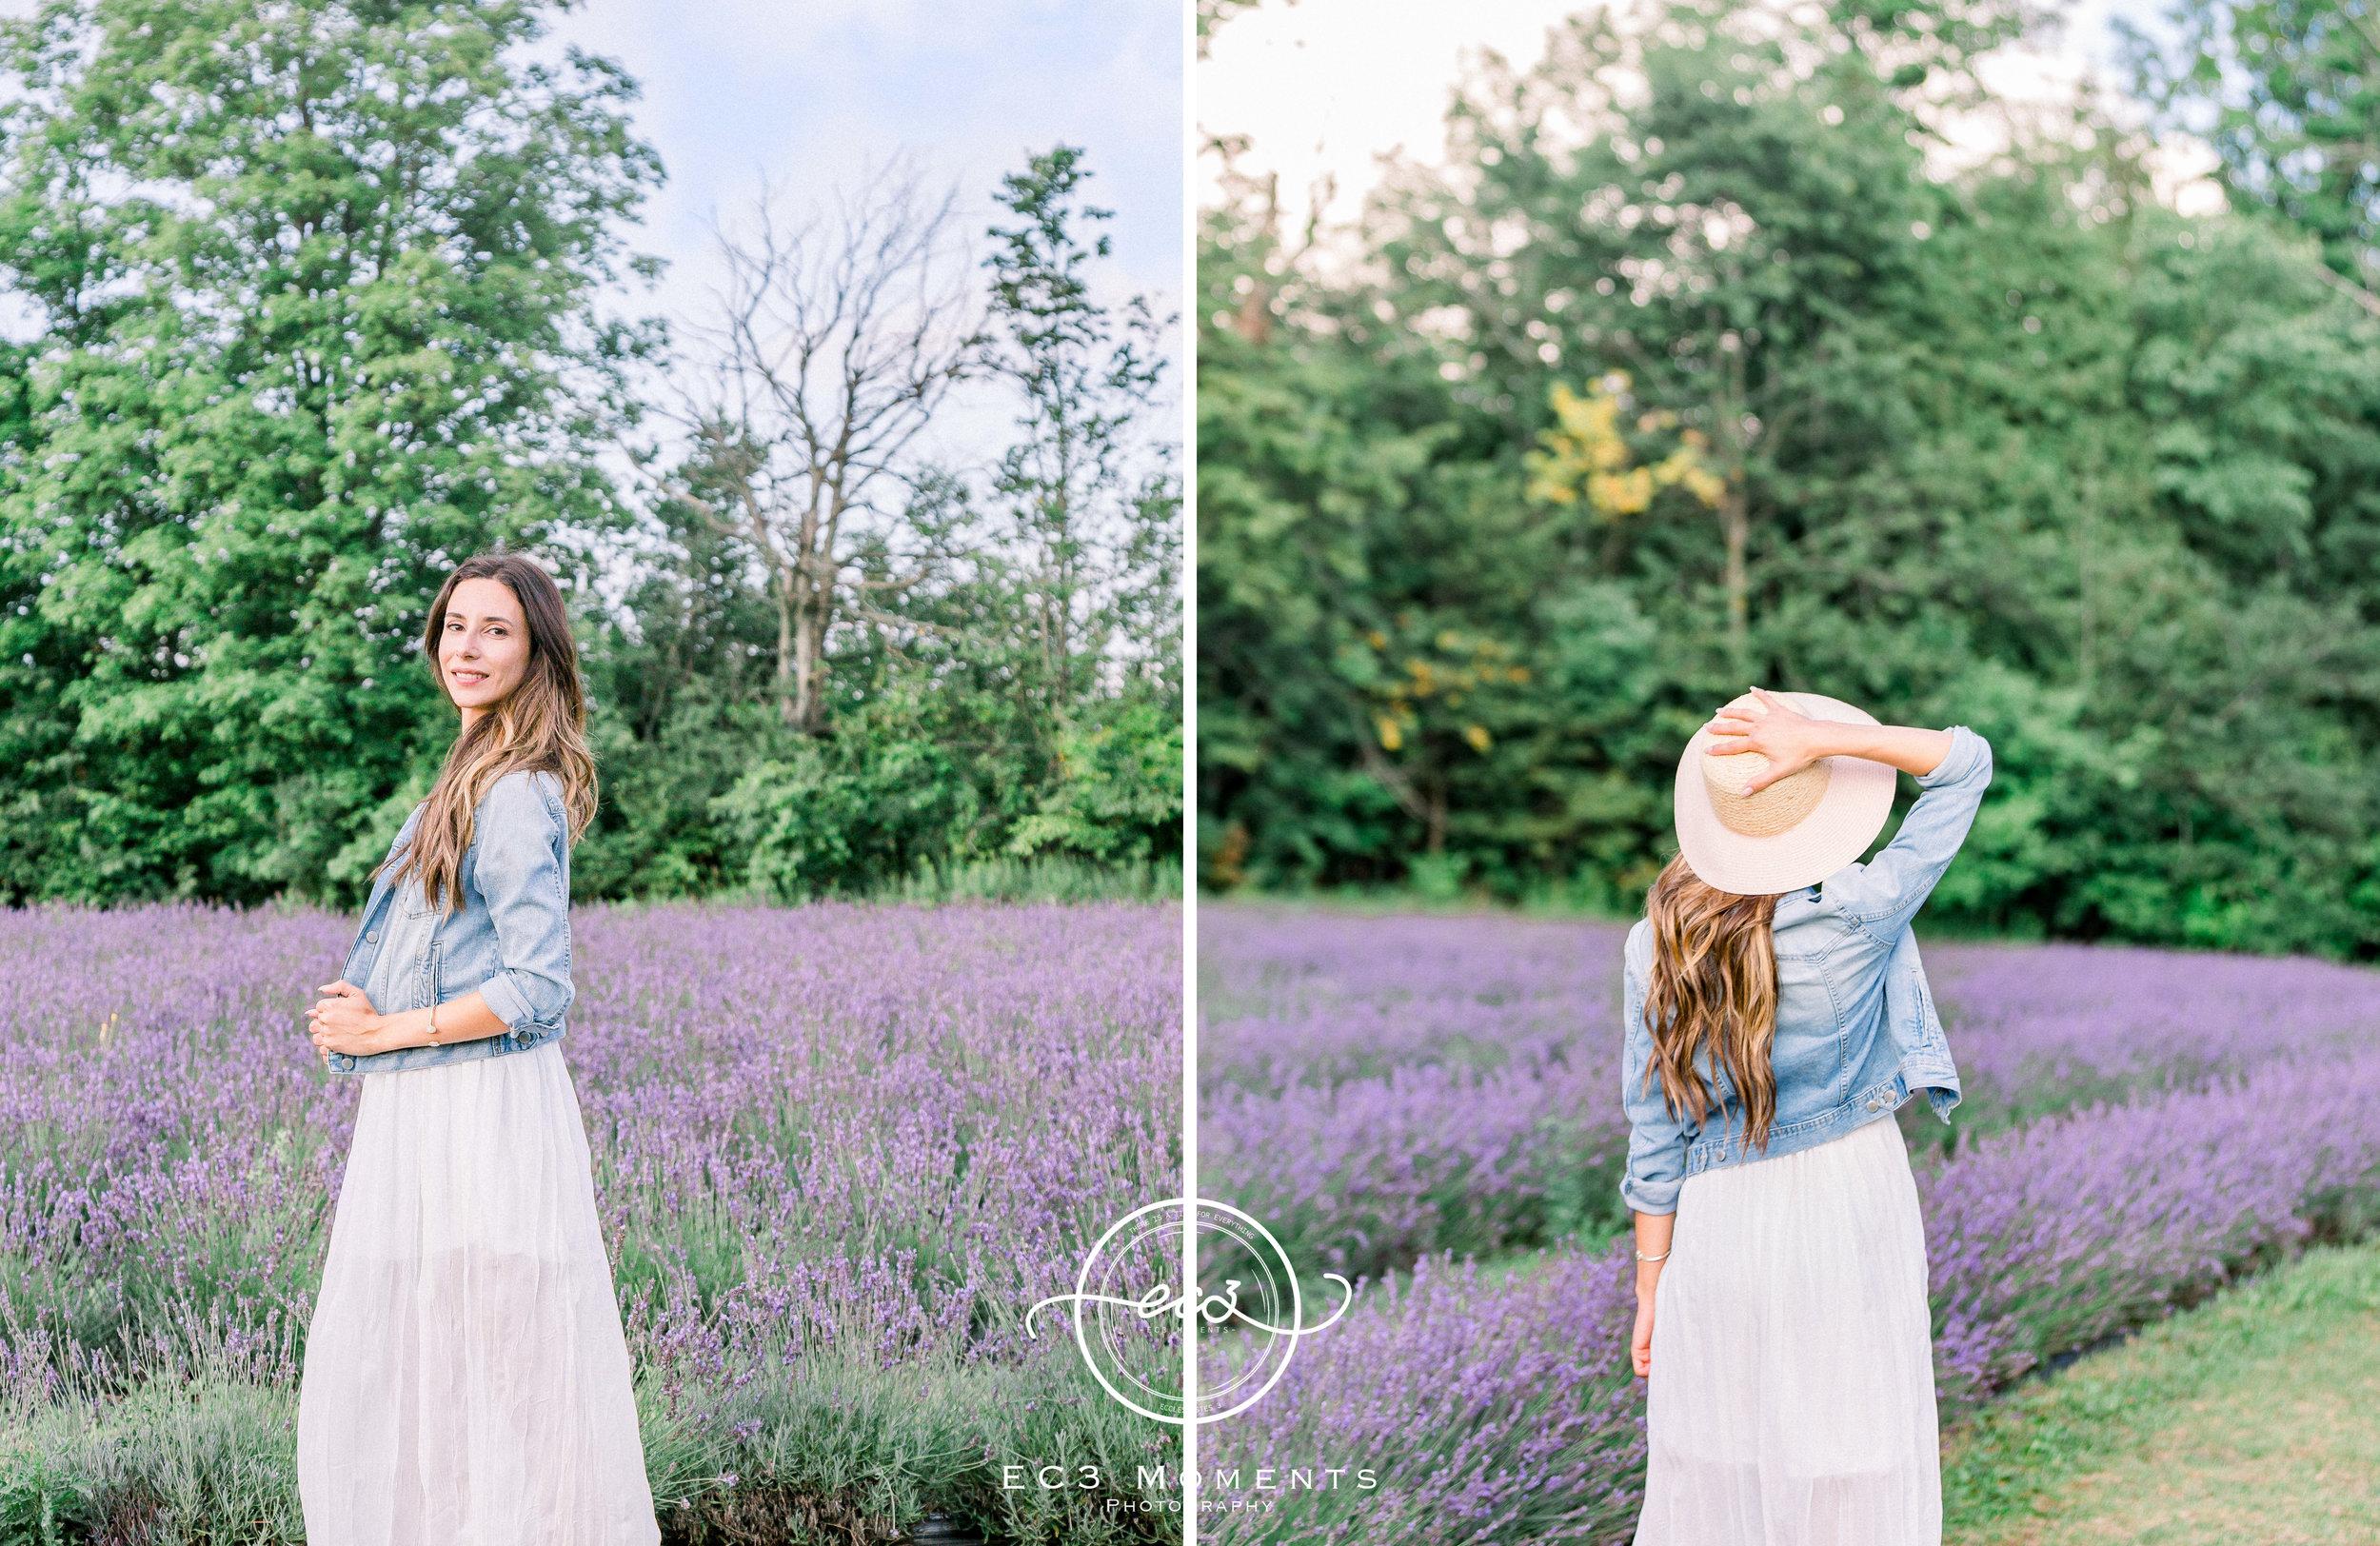 Laura & Ryan Terre Bleu Summer Surprise Proposal 3.jpg